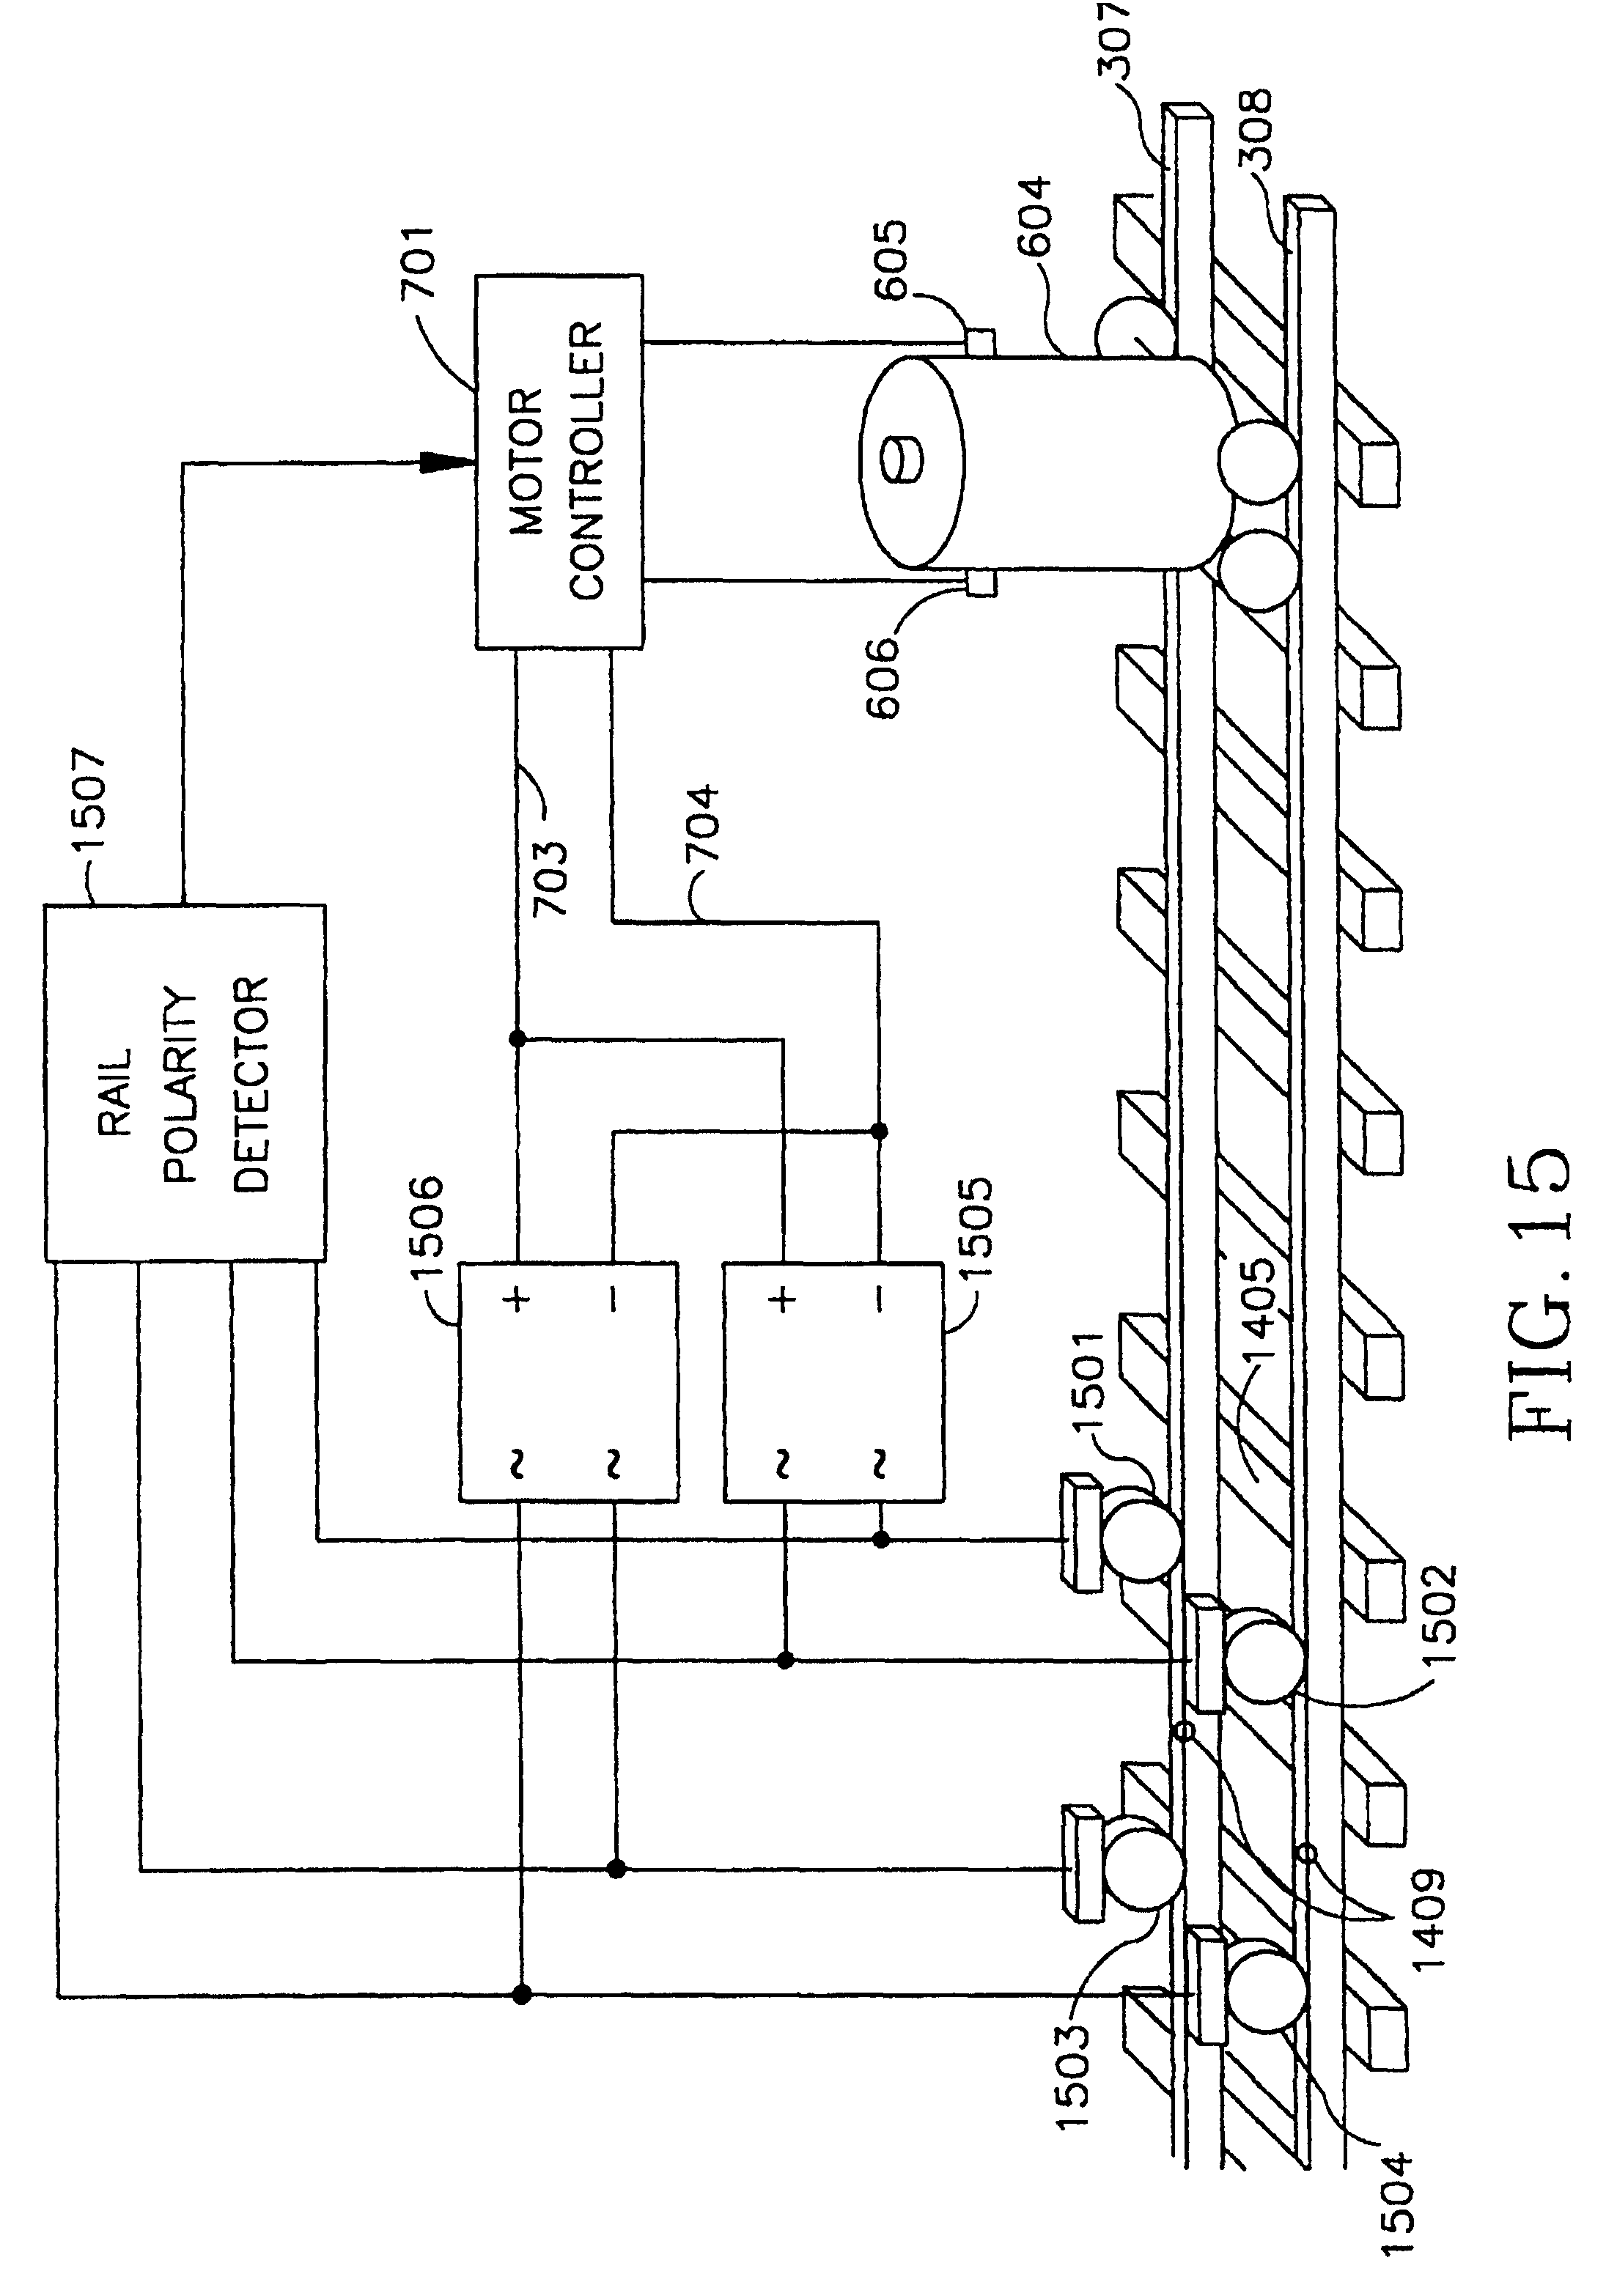 Lionel 675 Wiring Diagram Www Toyskids Co